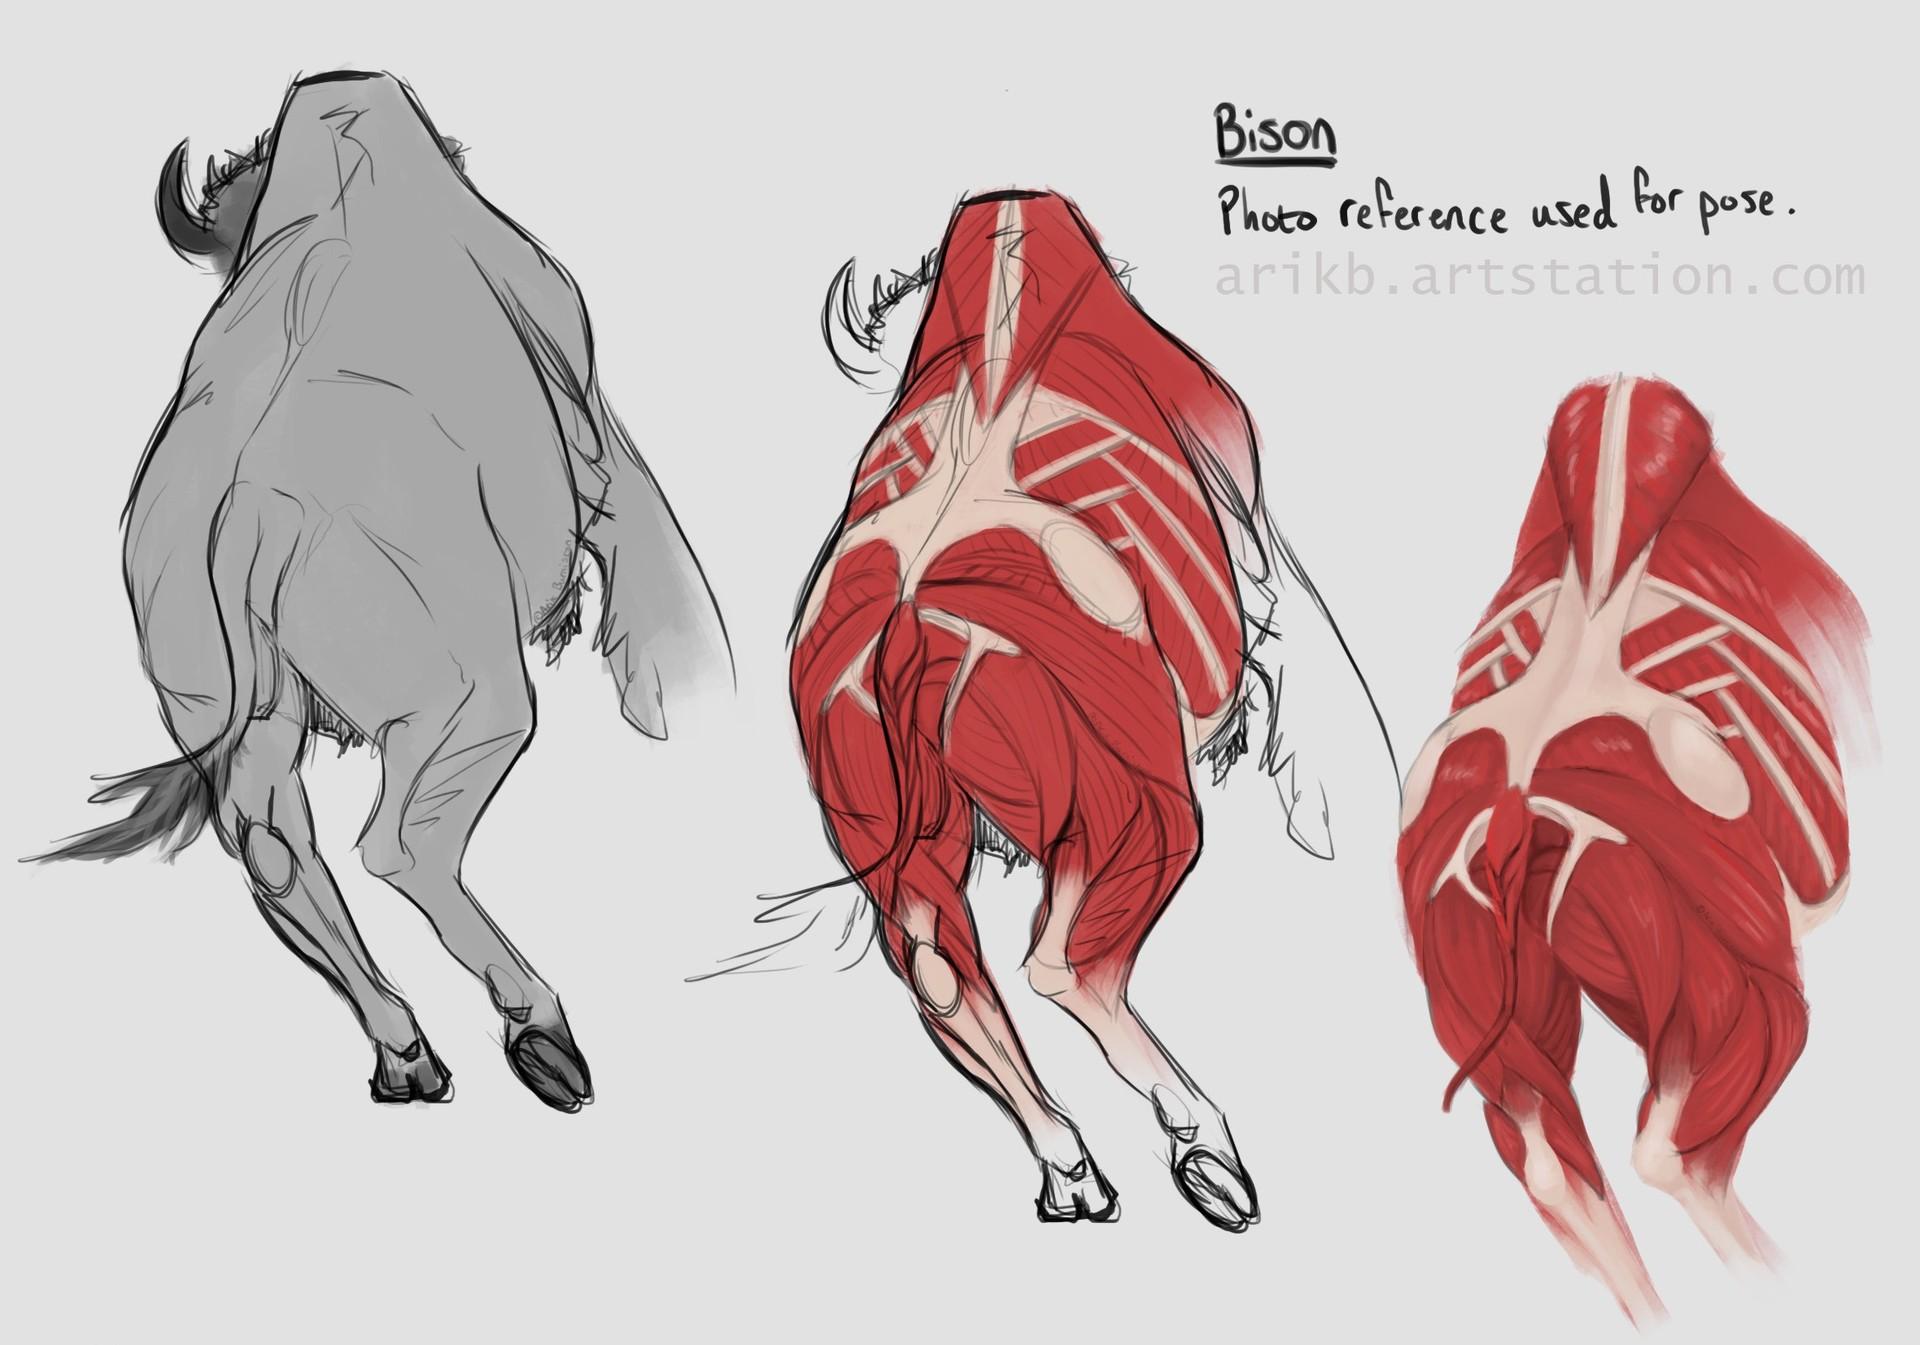 ArtStation - Animal Anatomy Studies, Arik Burniston